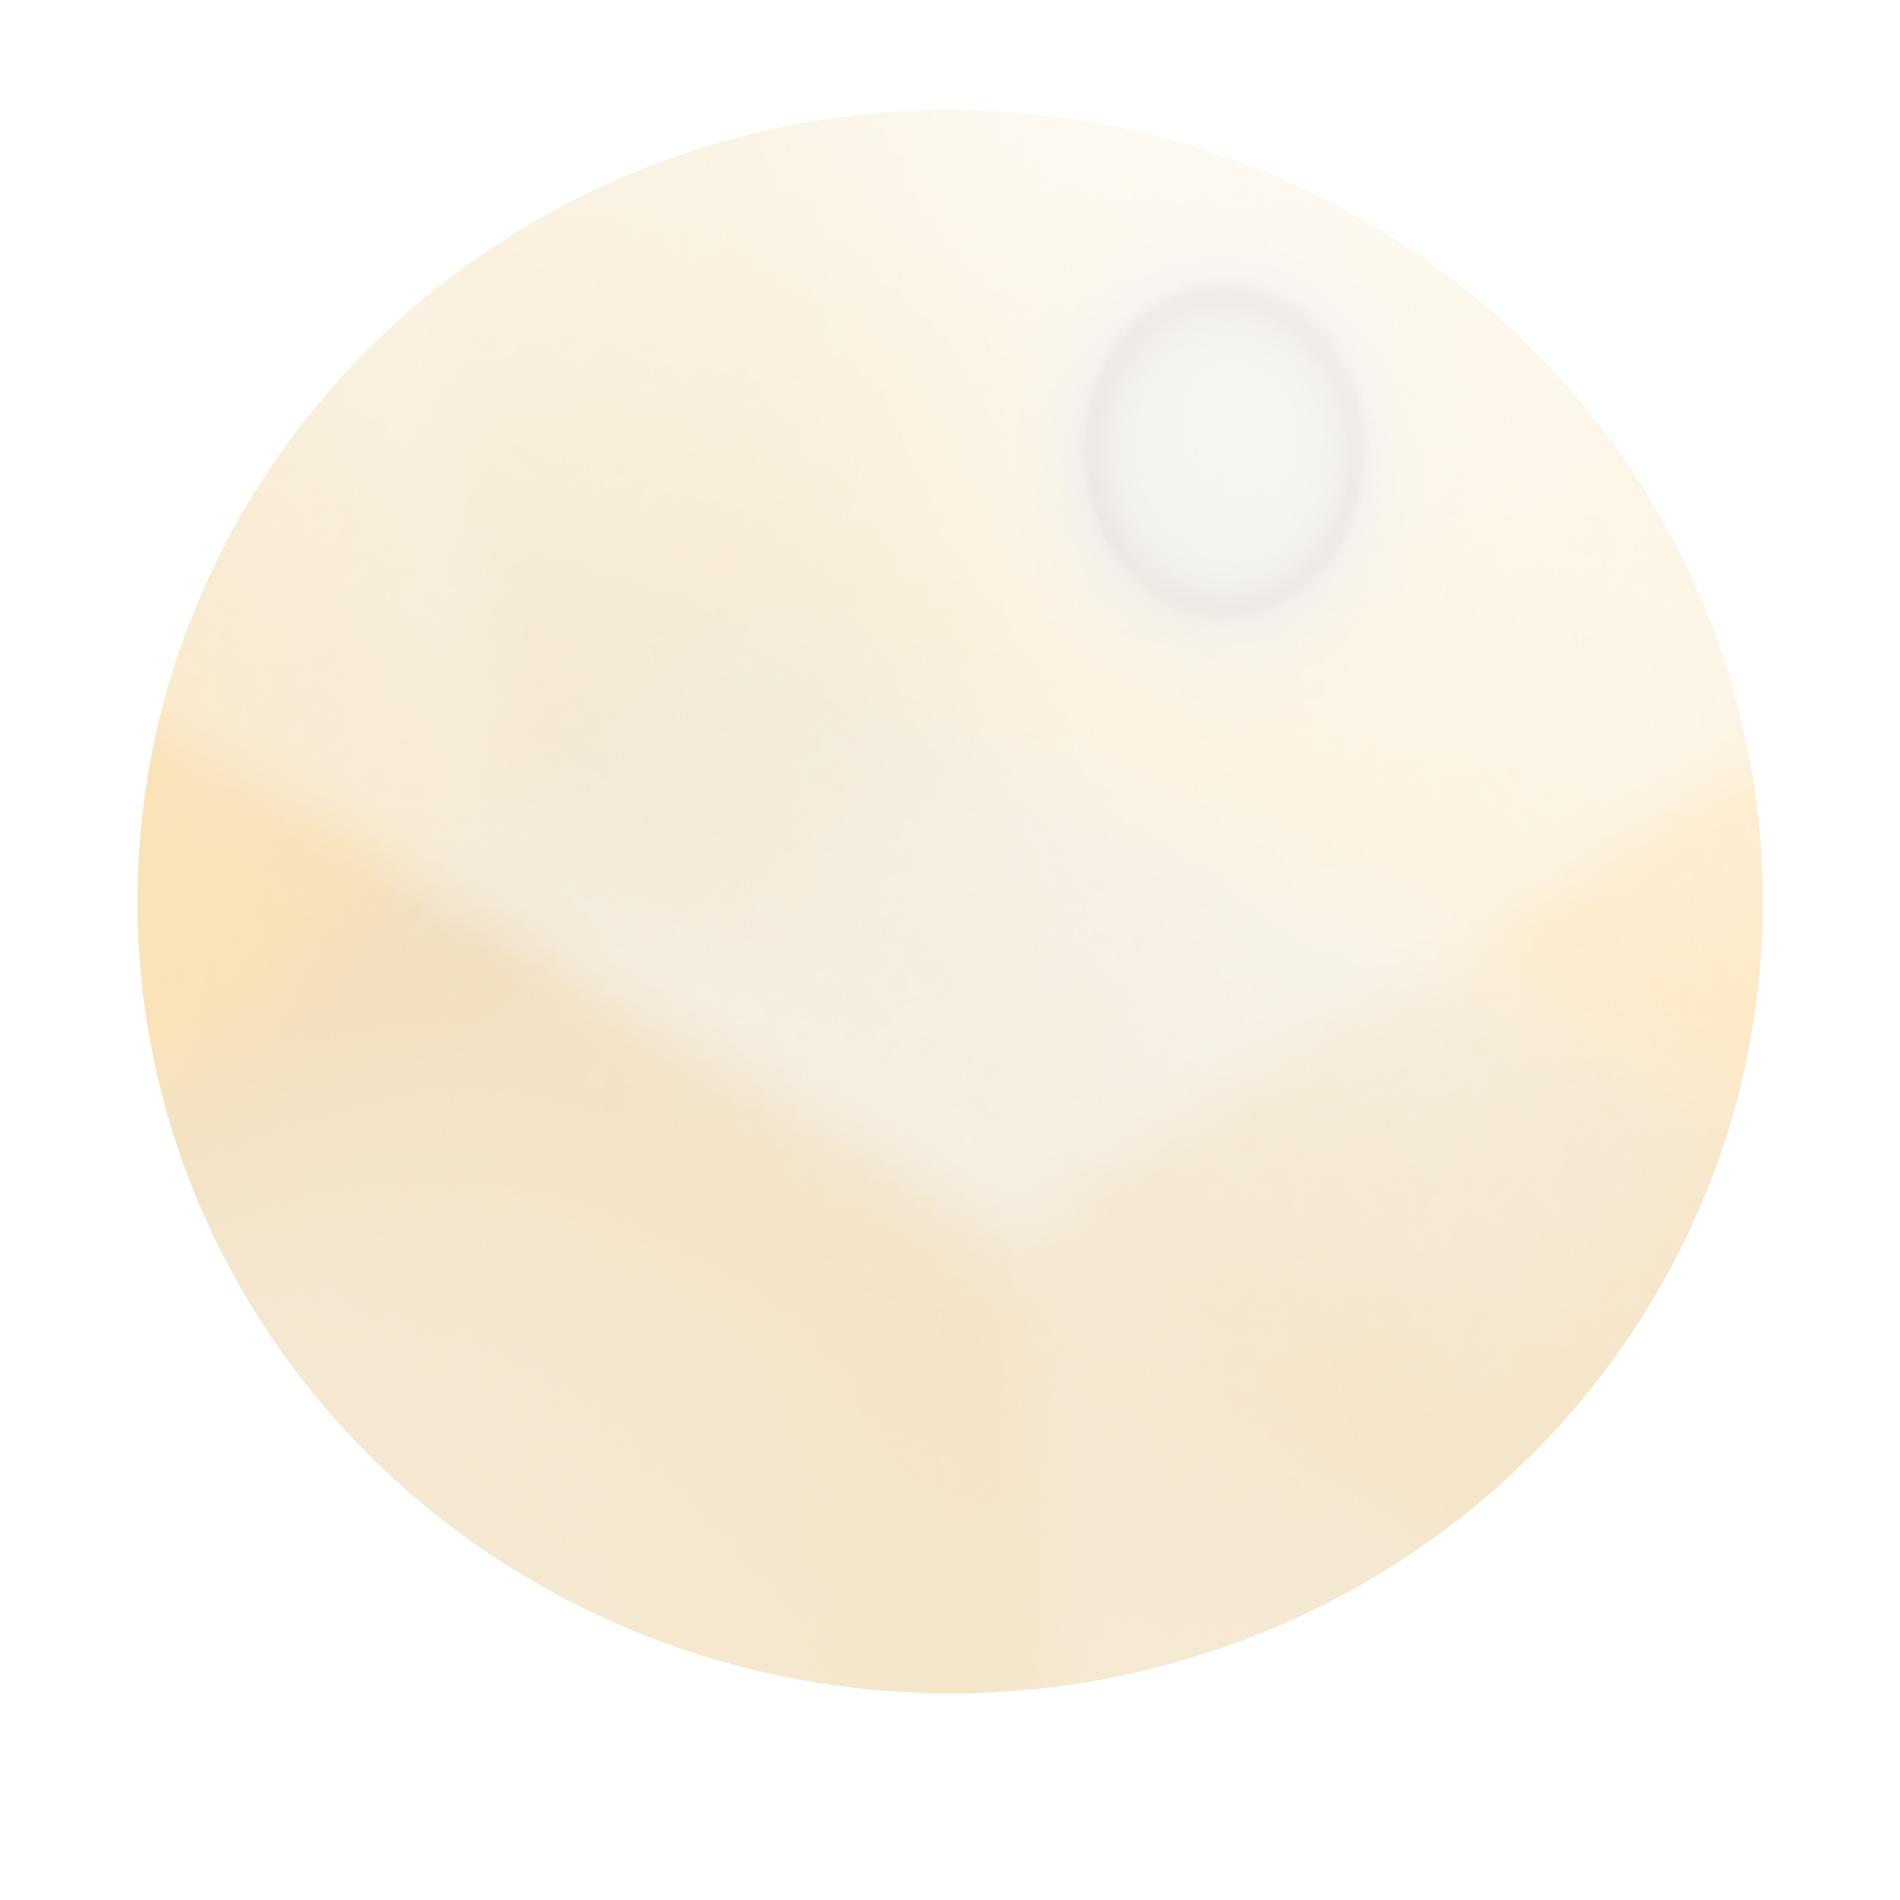 Orb 16